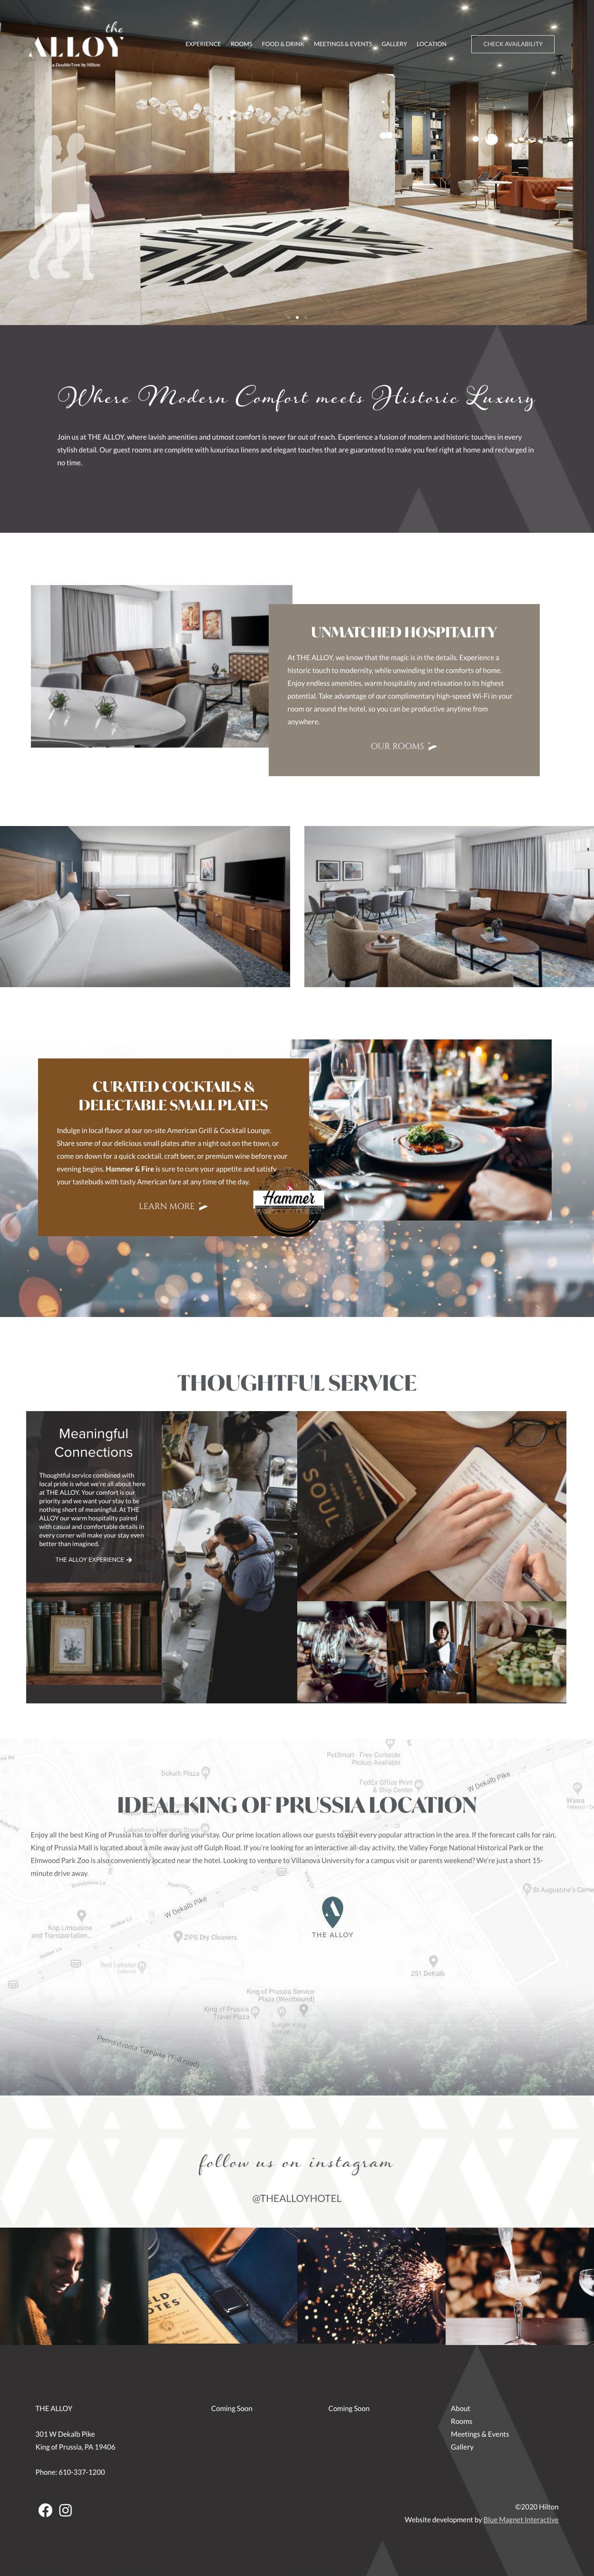 web design example alloy